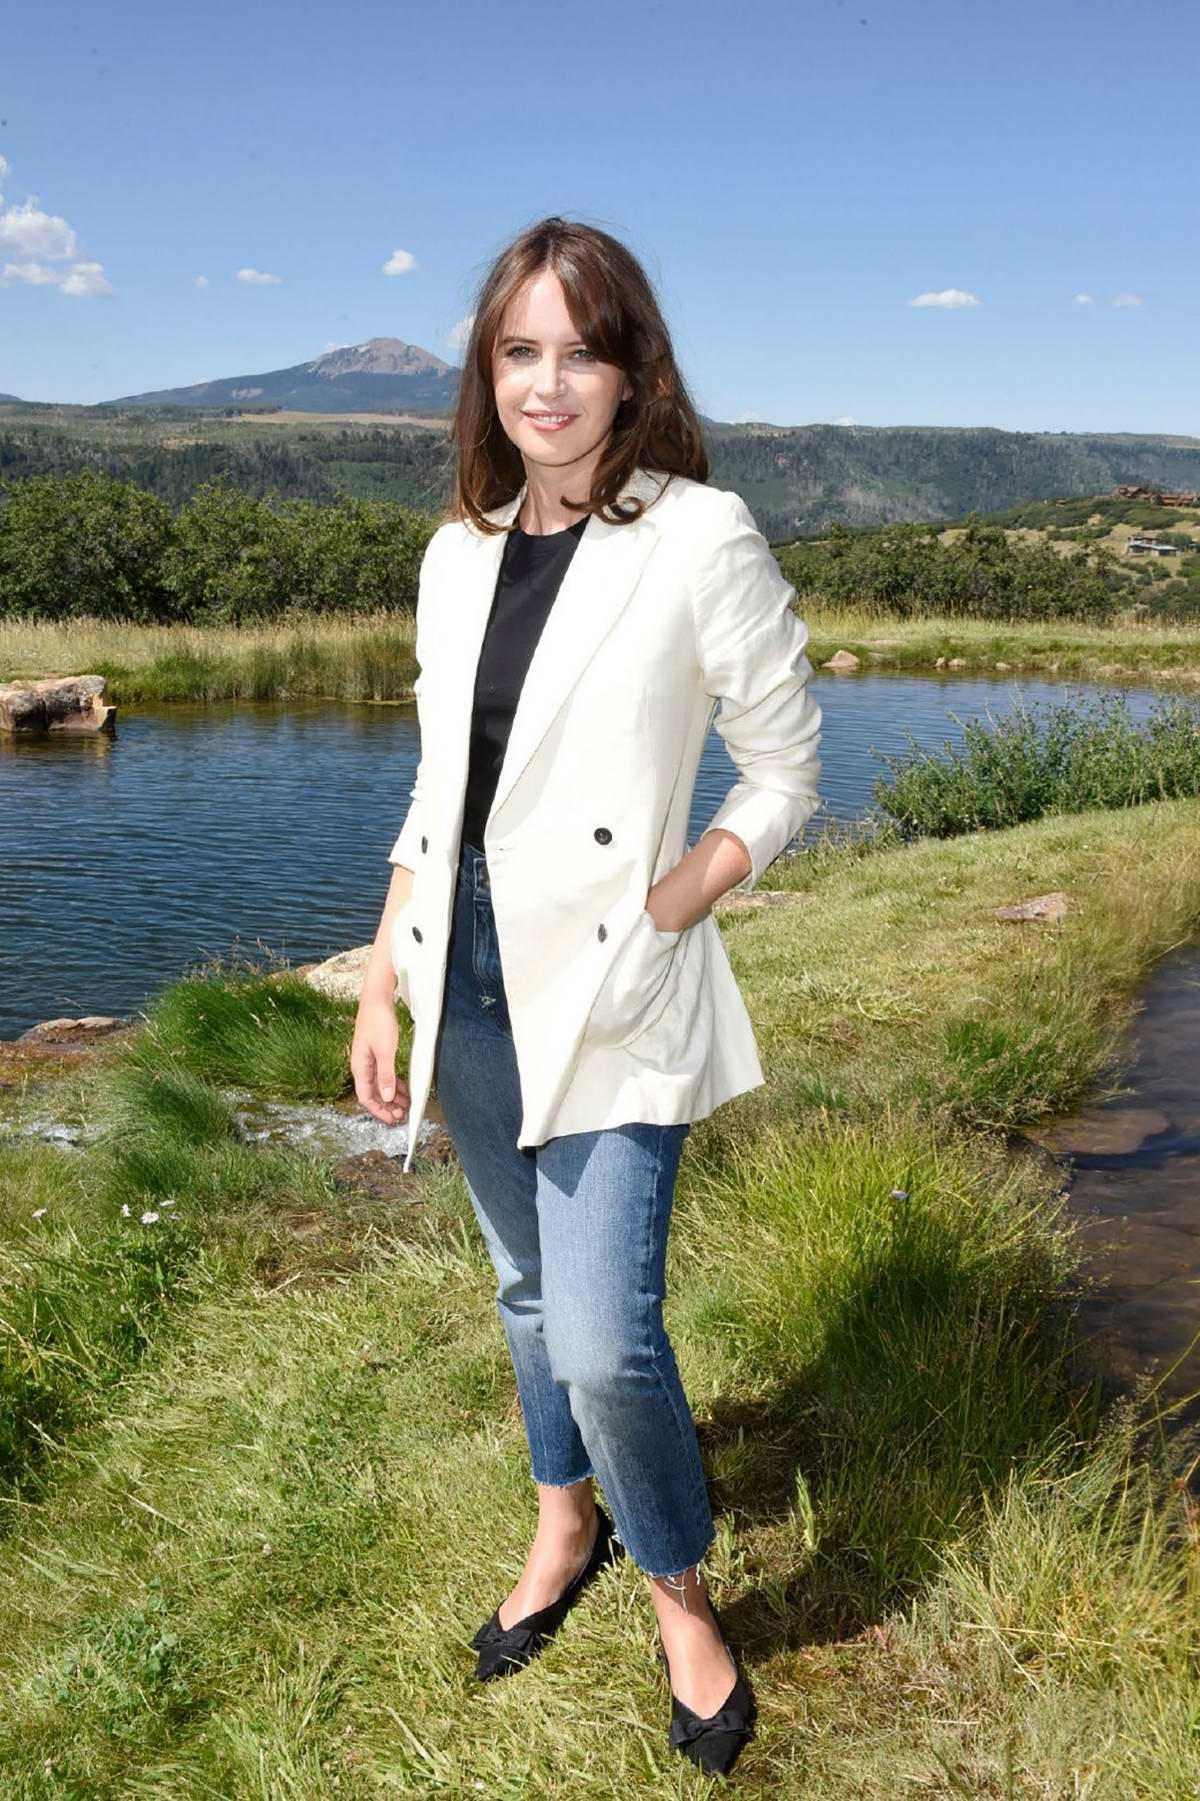 Felicity Jones attends the photocall of 'The Aeronauts' at the 2019 Telluride Film Festival in Telluride, Colorado